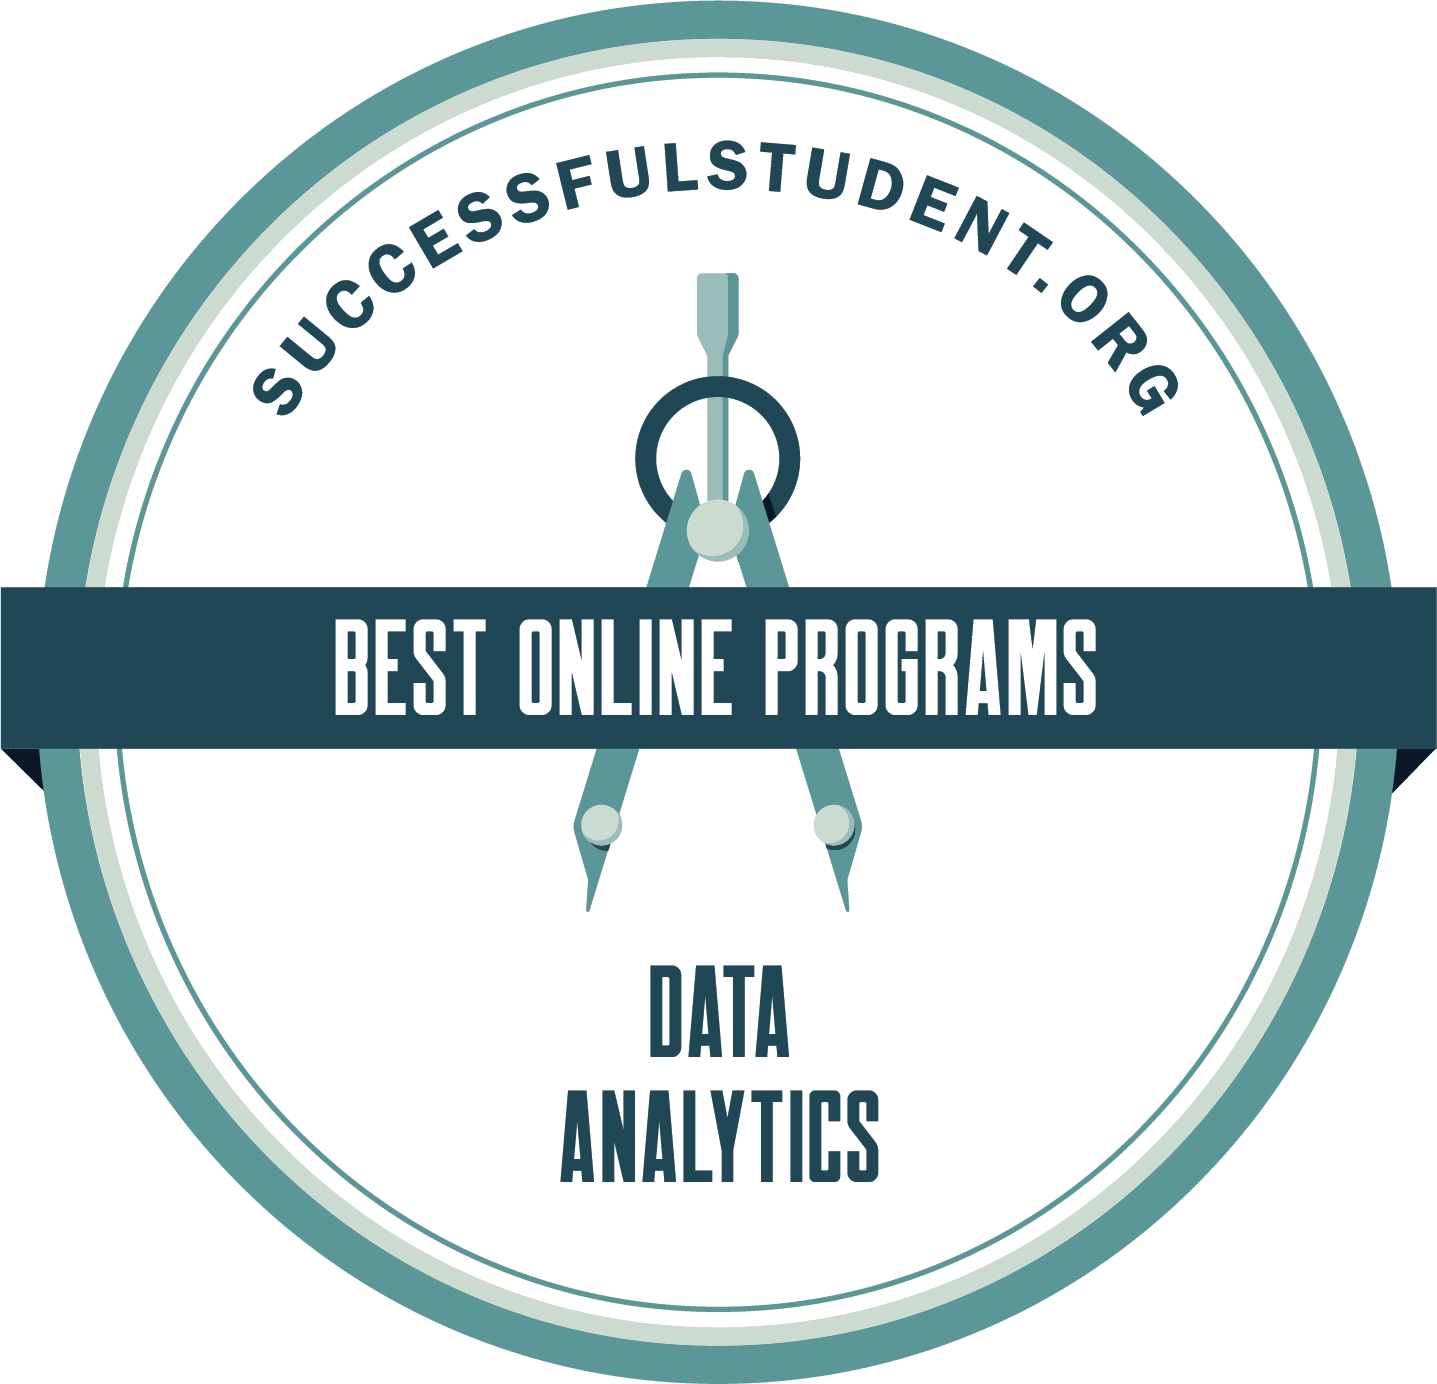 The Best Online Data Analytics Programs 2021's Badge